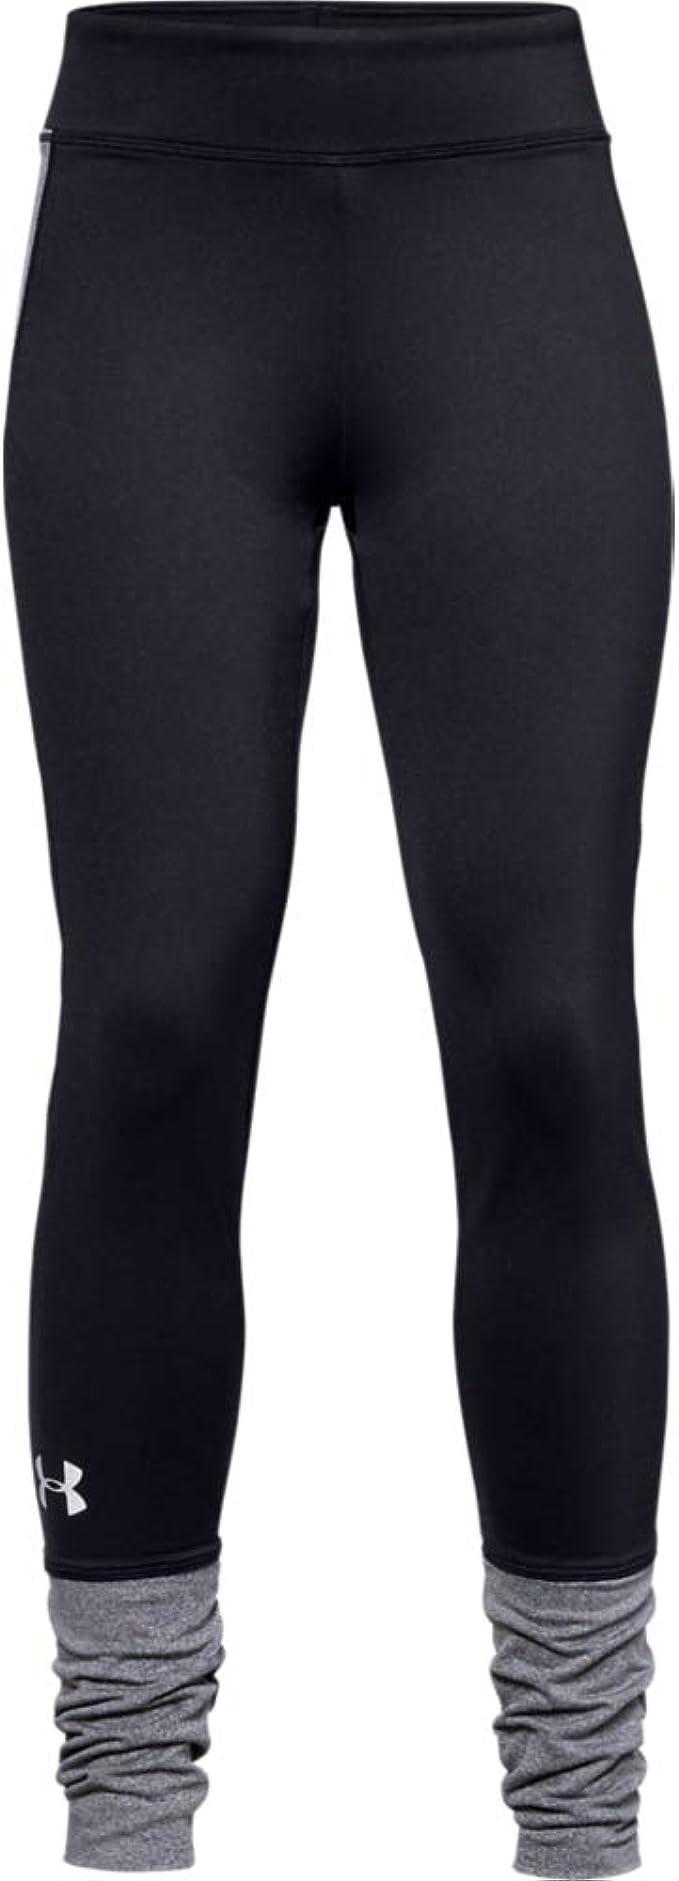 Under Armour Girls' Coldgear Legging